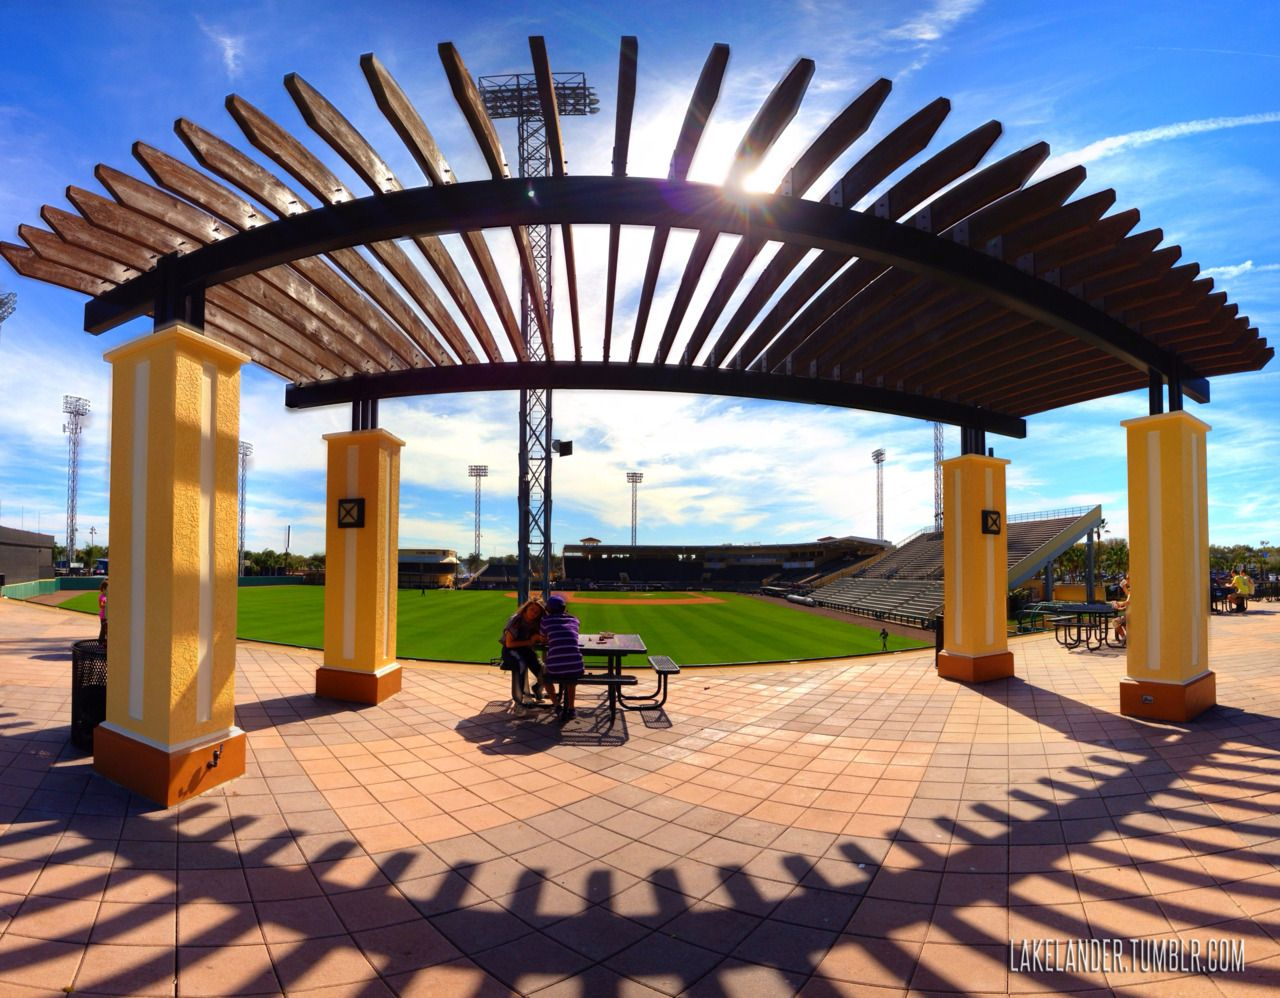 Joker Marchant Stadium in Lakeland, Florida #CentralFL # ...